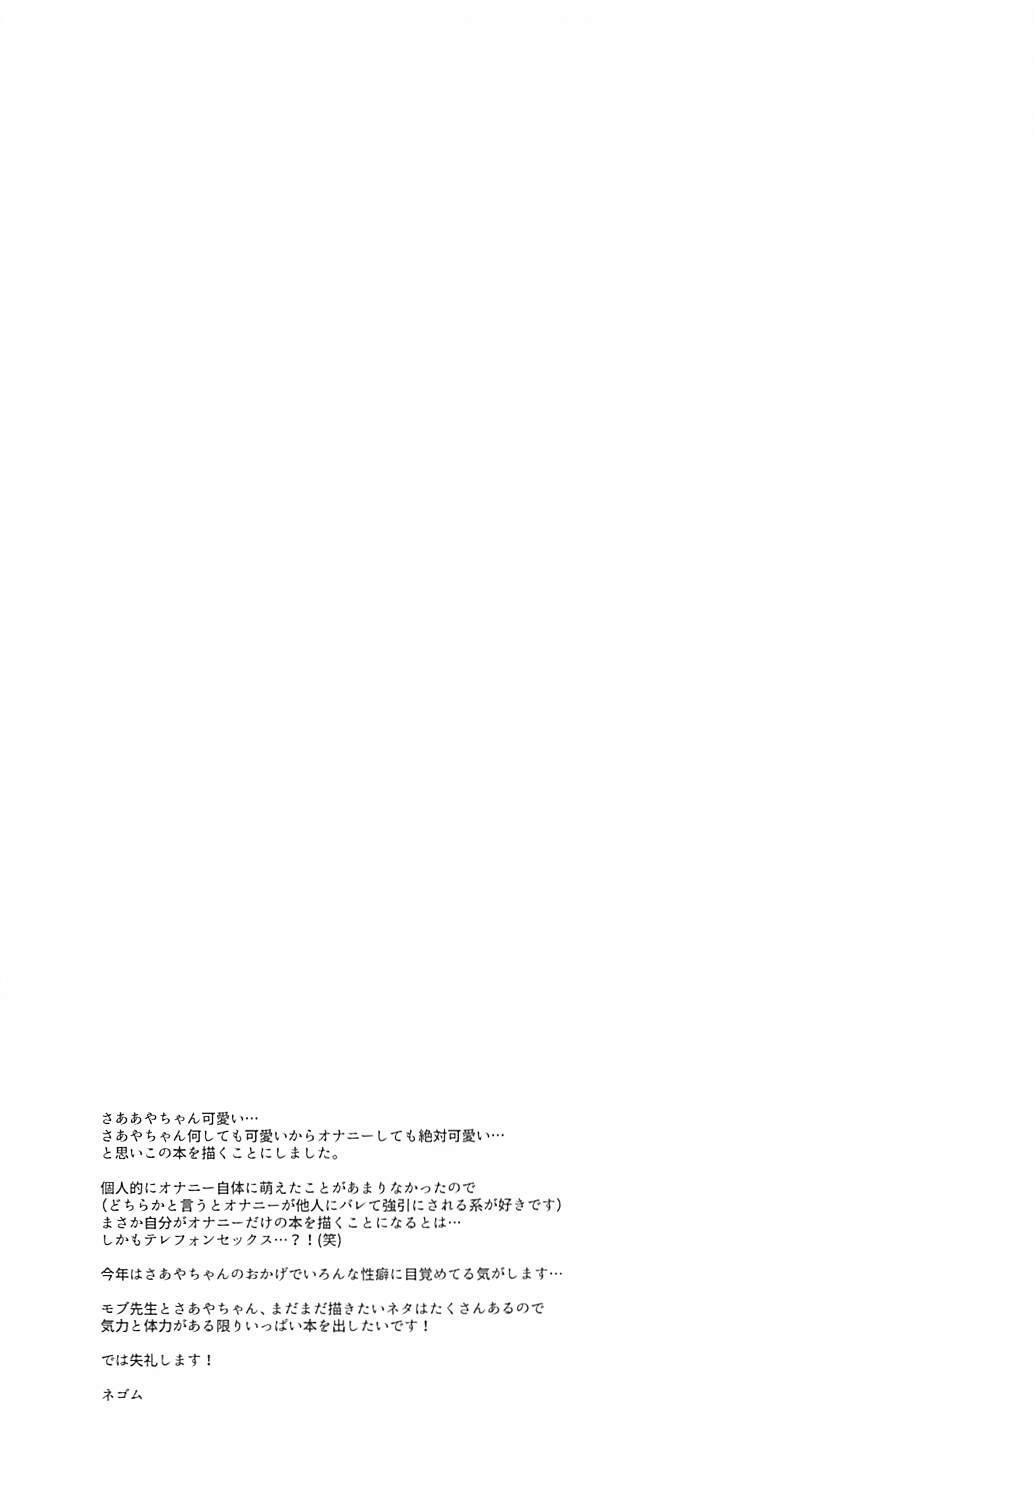 Tenshi no Himegoto 25